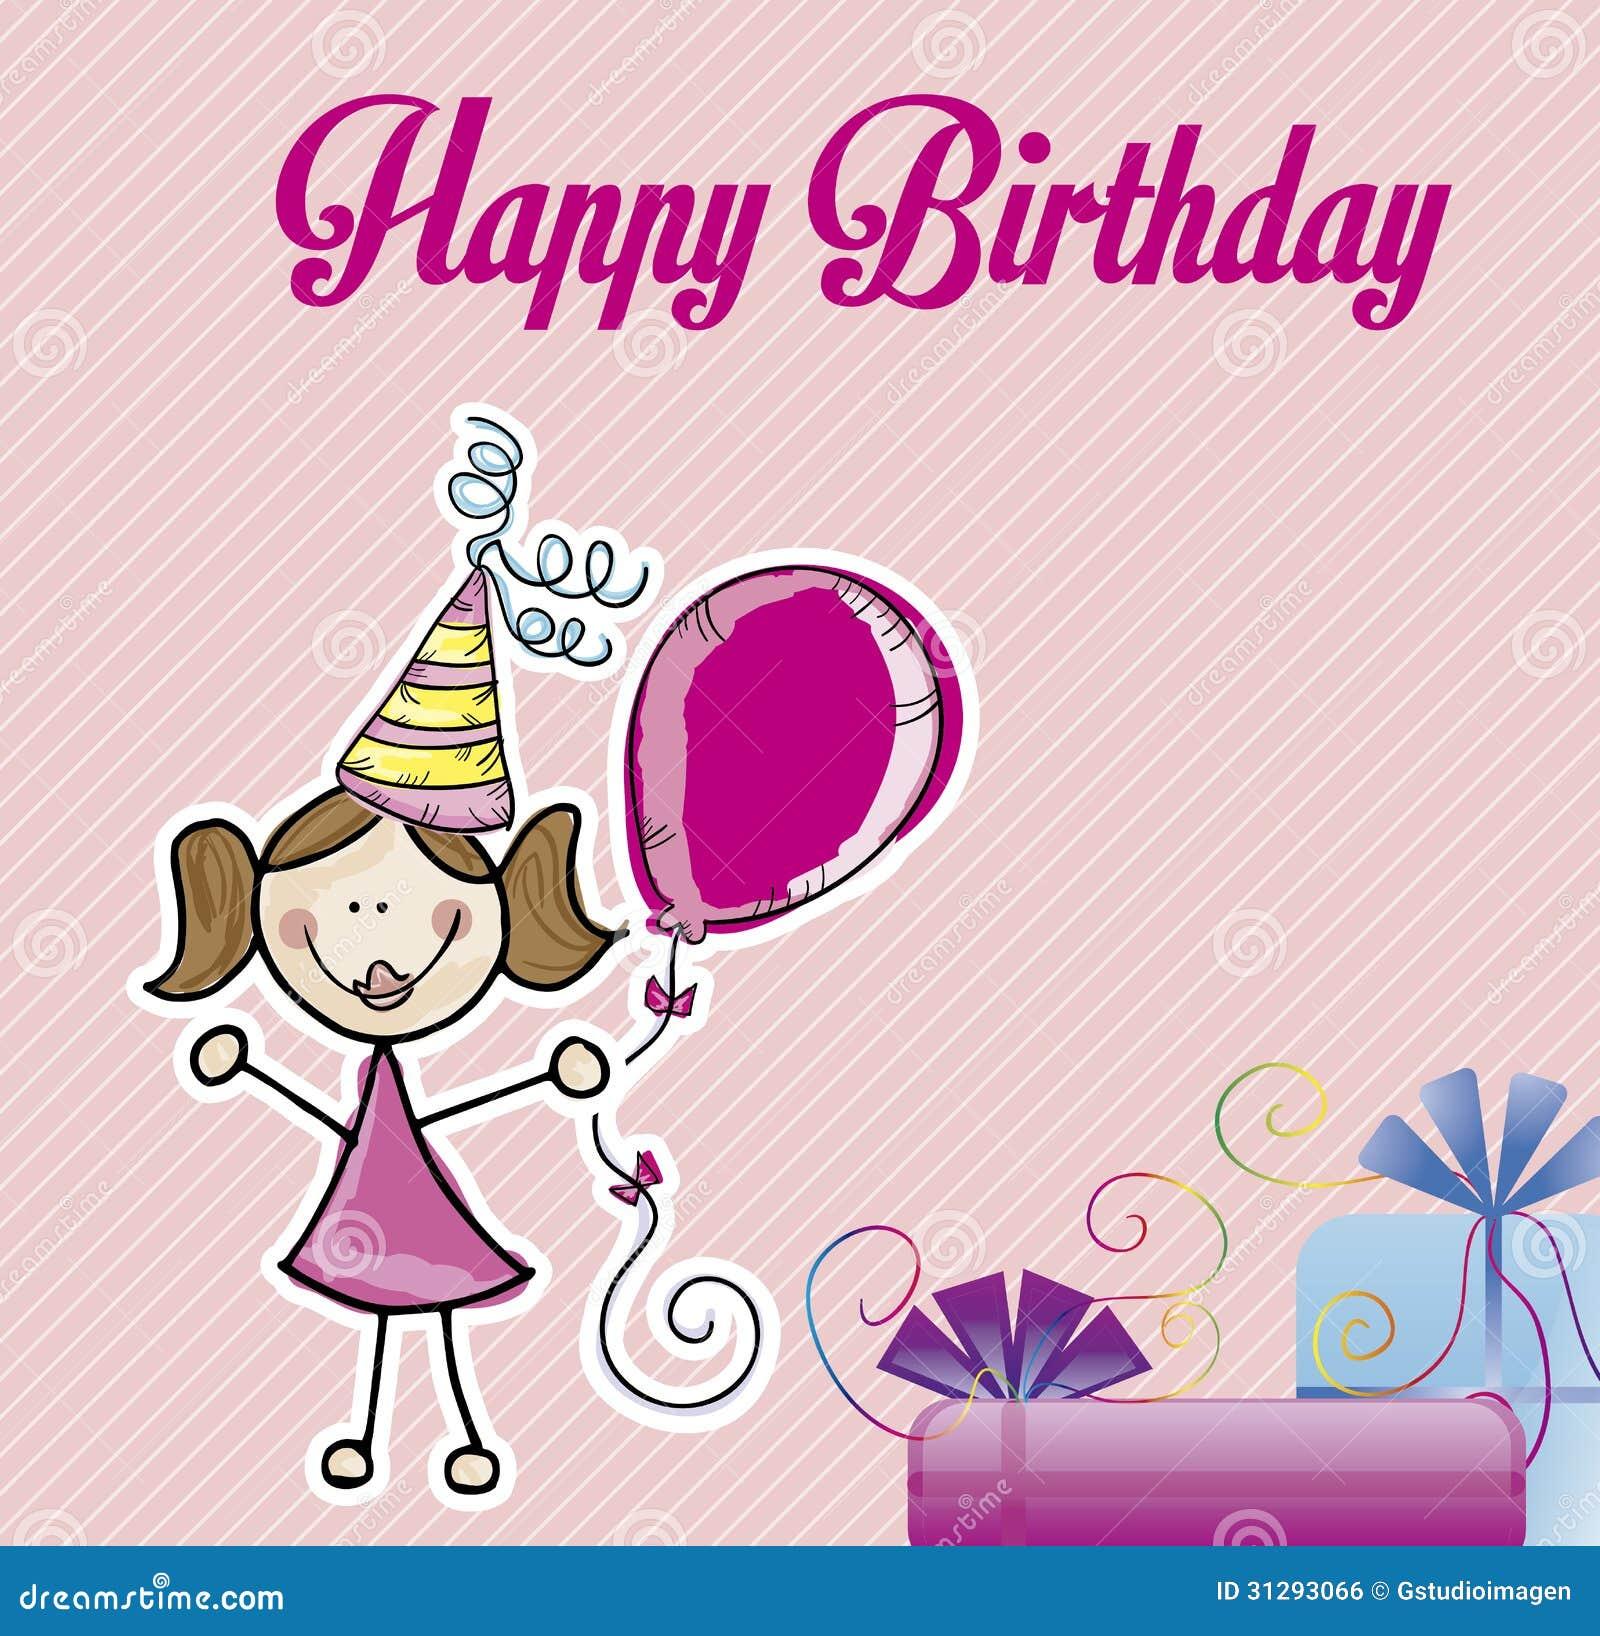 Happy Birthday Girl Illustration ~ Happy birthday girl stock vector illustration of art